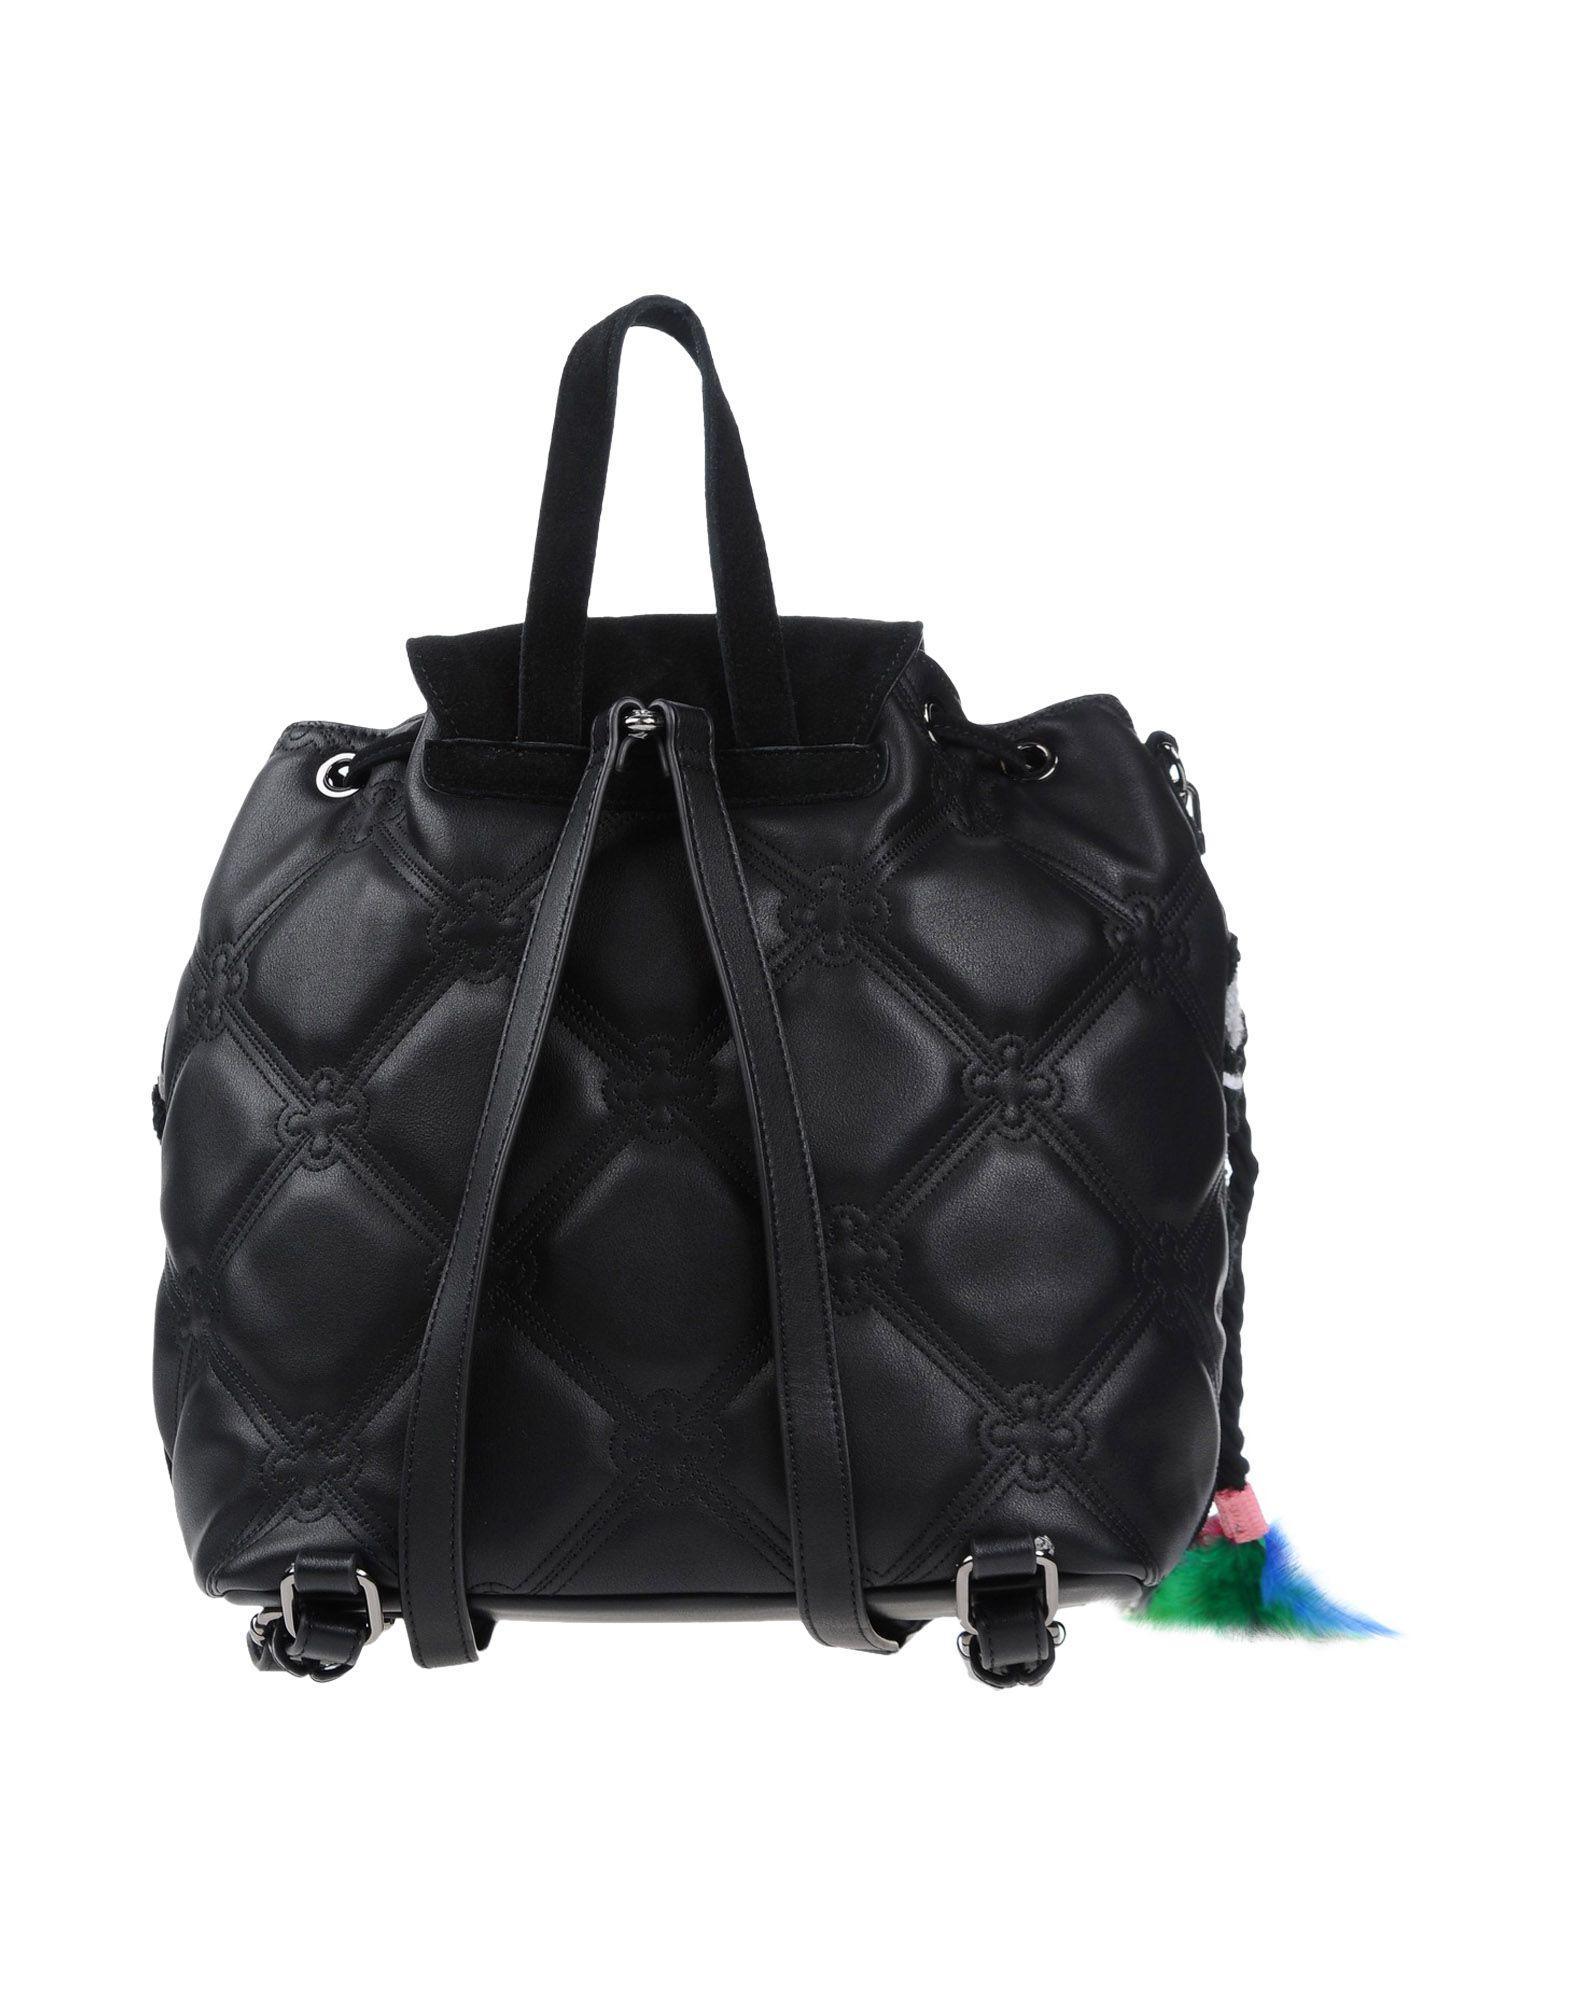 V73 Leather Backpacks & Bum Bags in Black